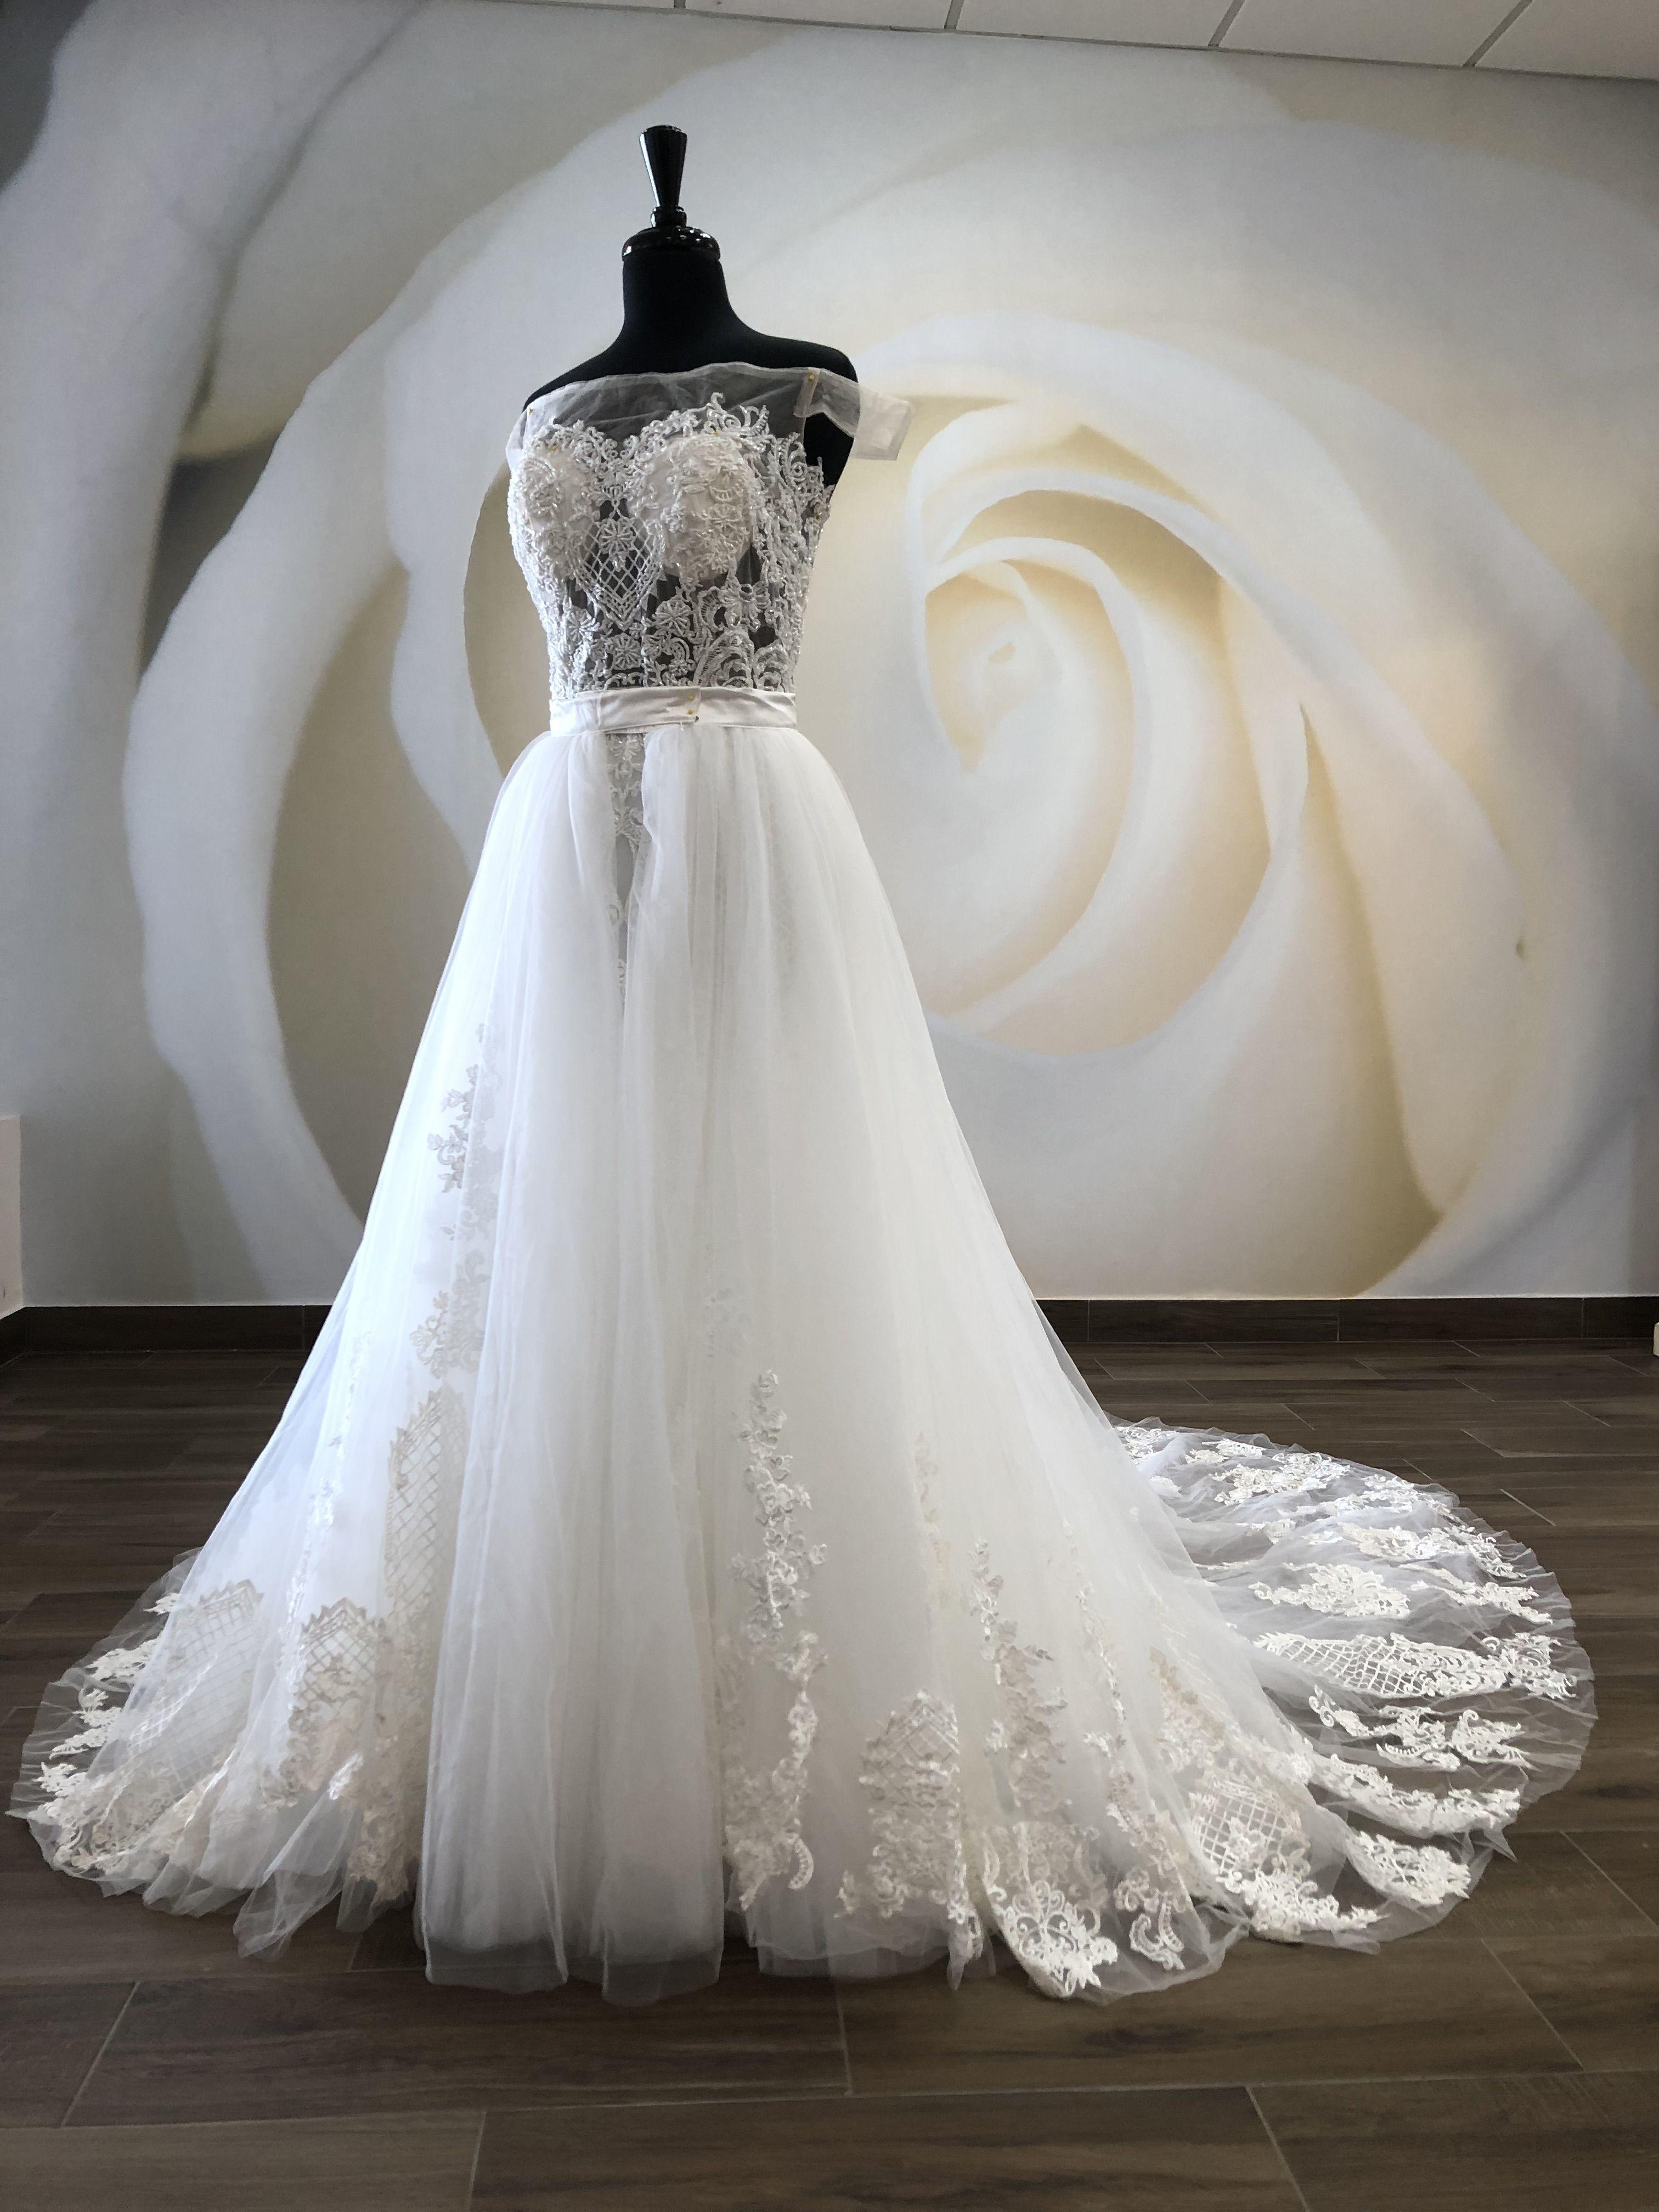 Chicago Dress With Detachable Skirt Wedding Dresses Lace Dresses Detachable Skirt